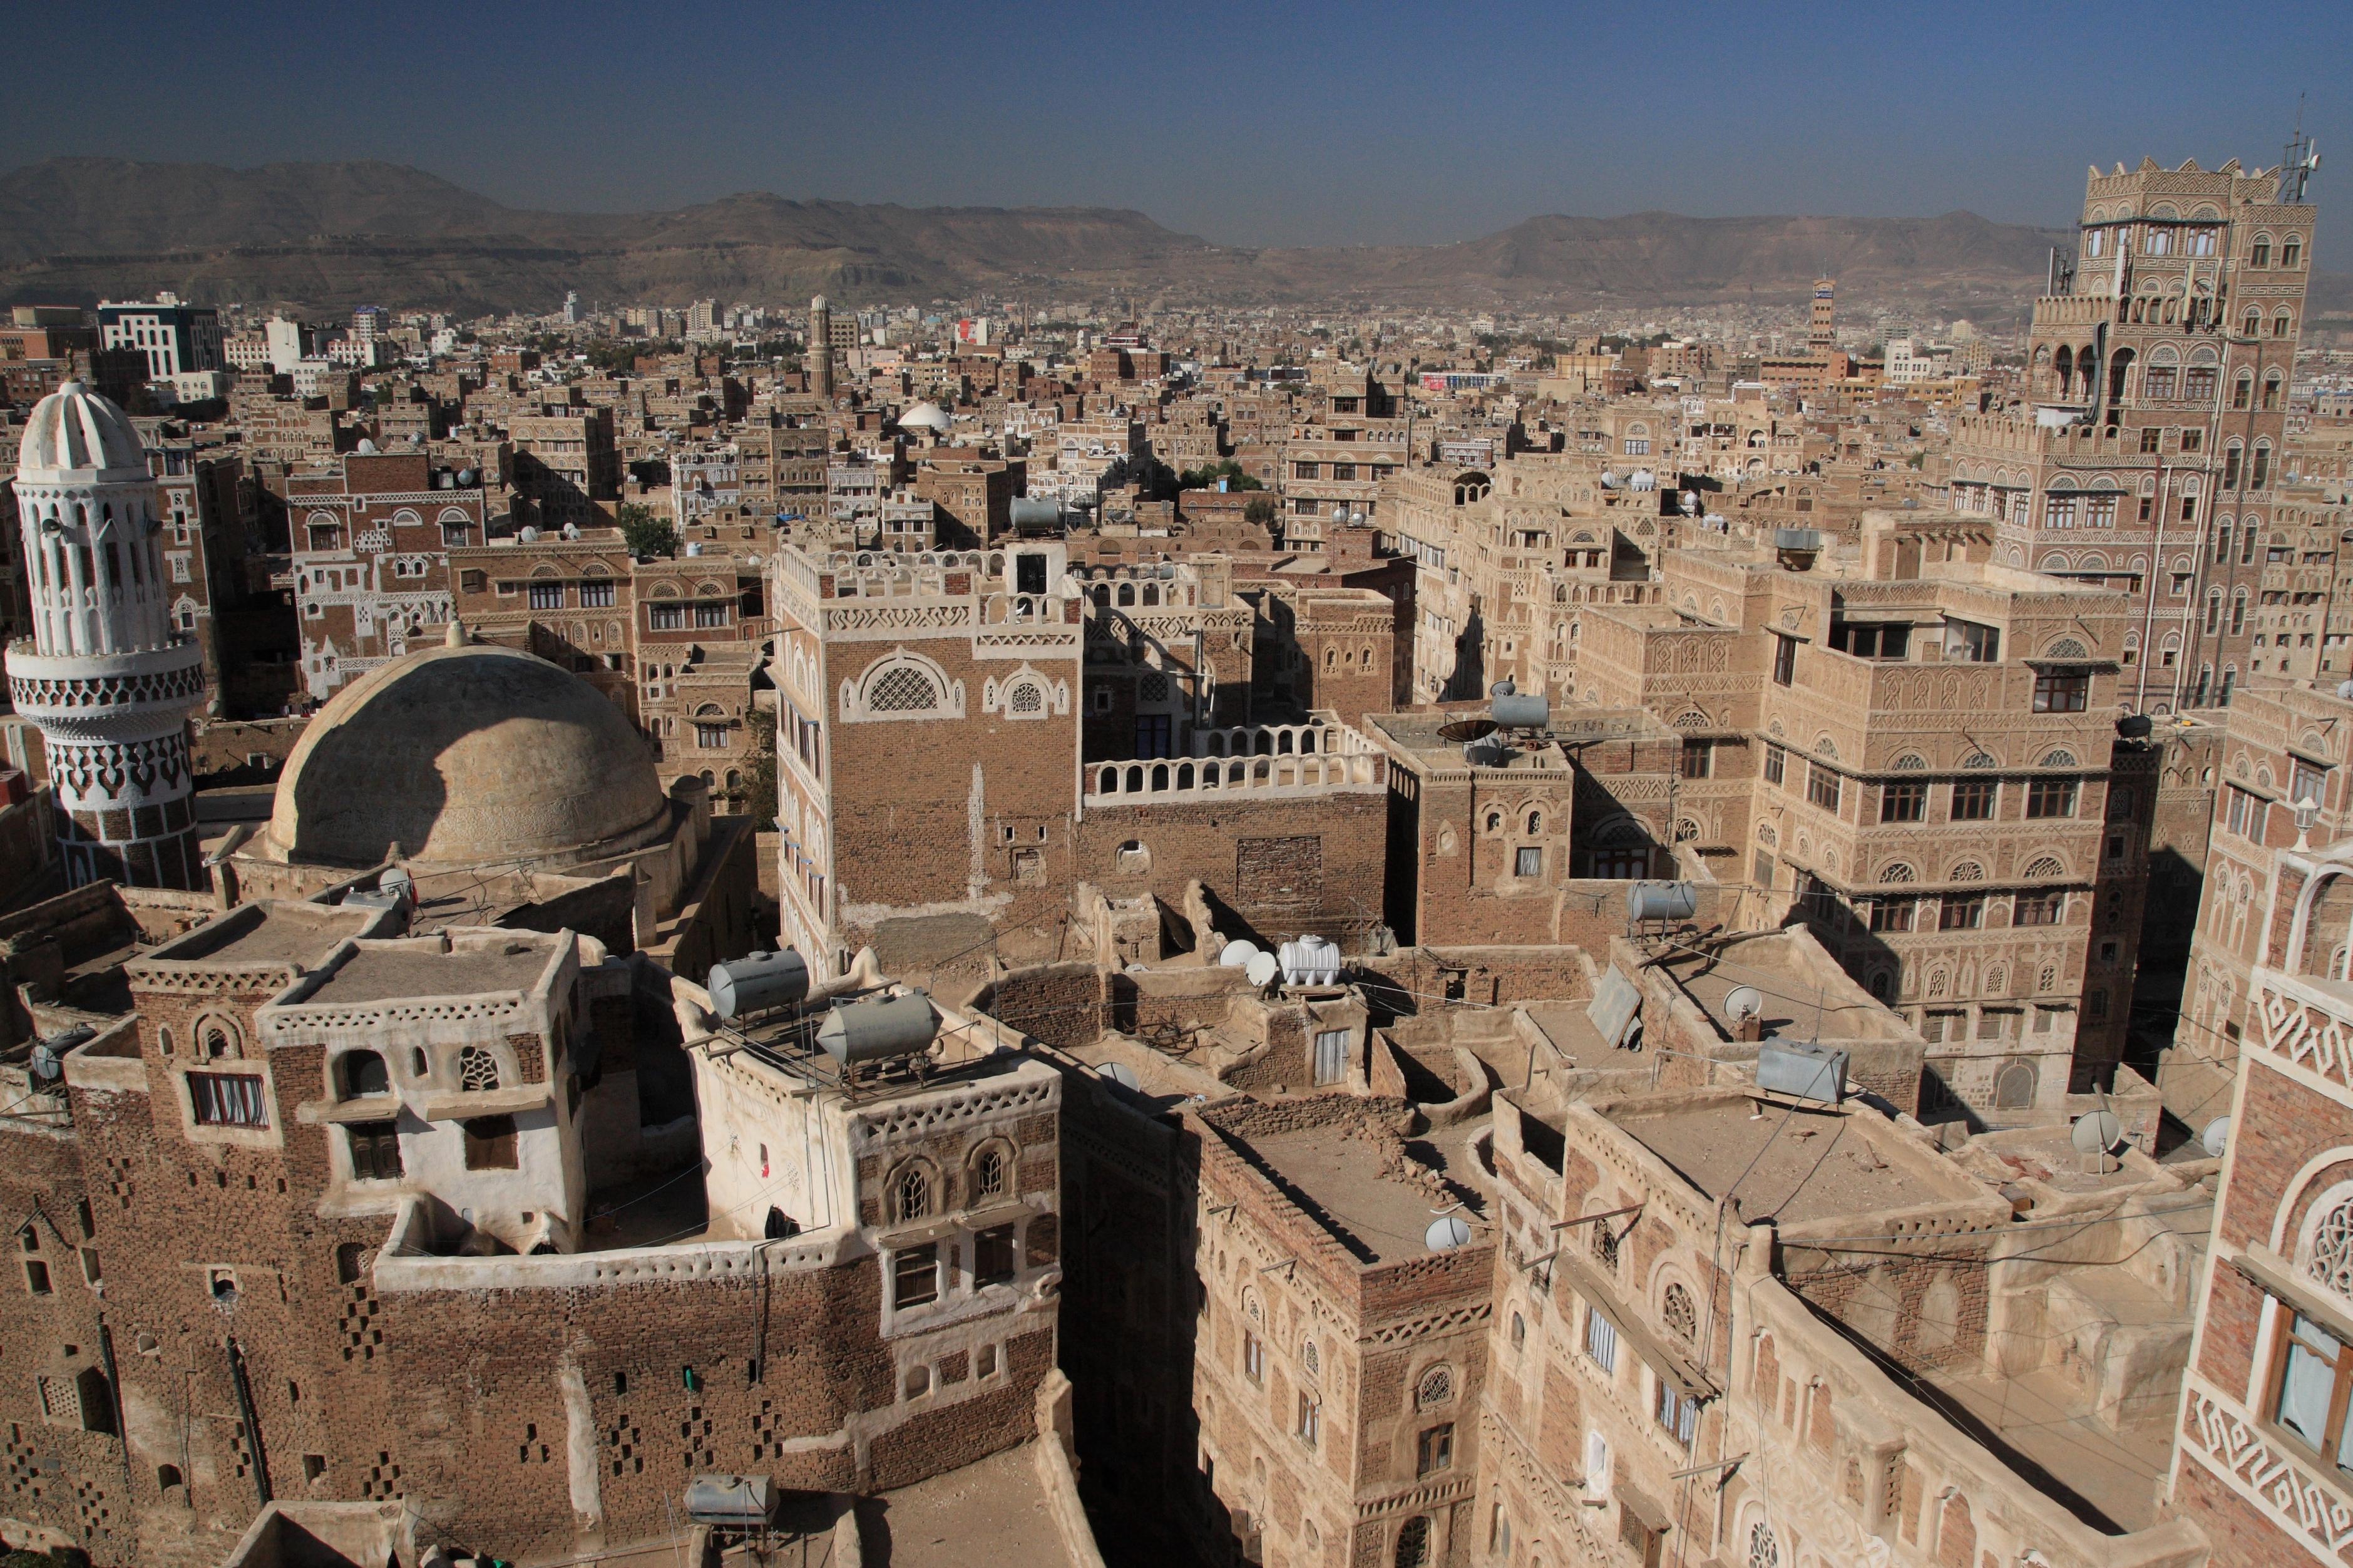 Sana_Yemen_4324293041